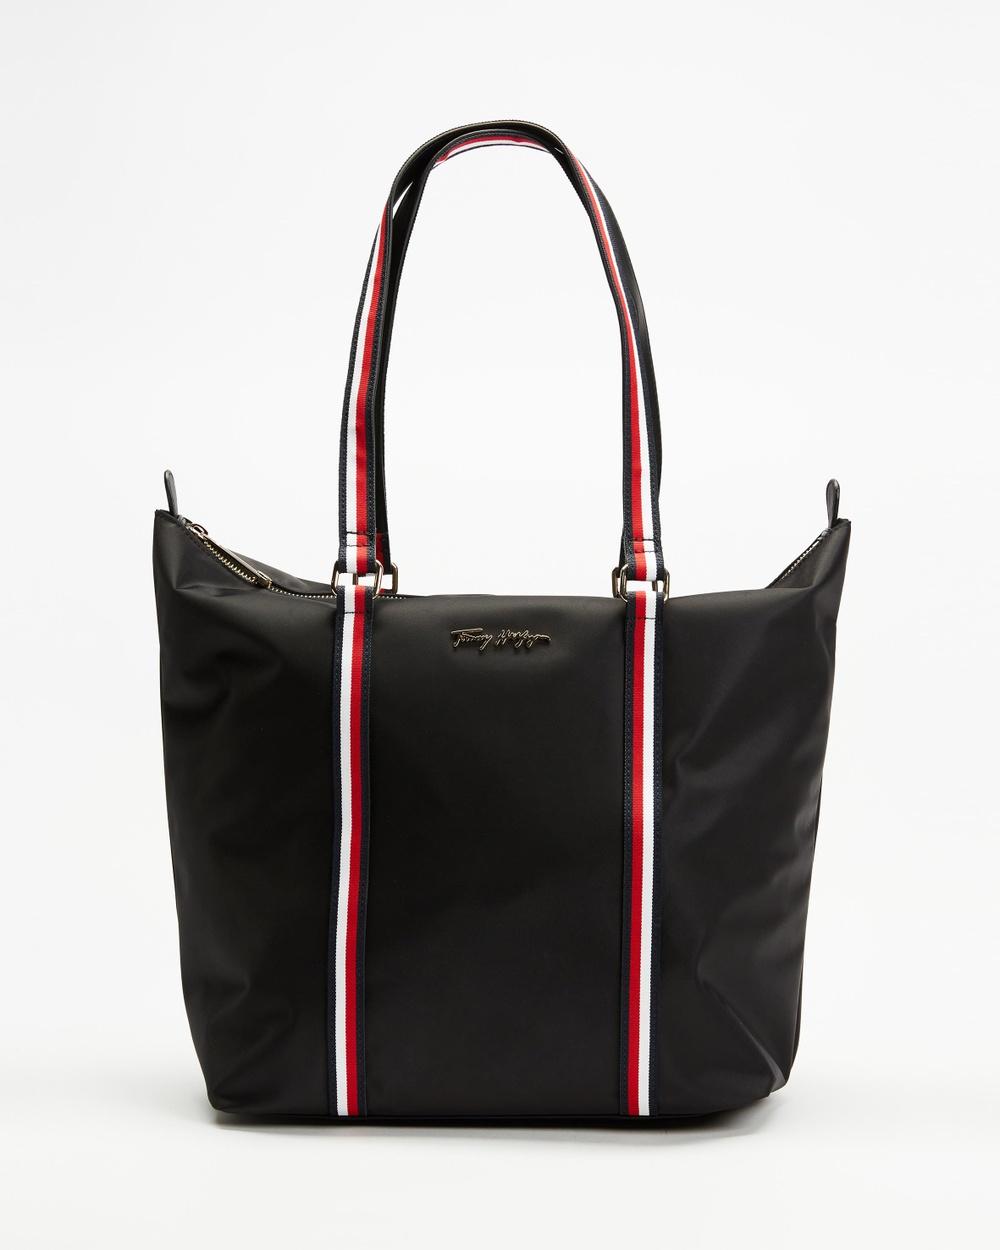 Tommy Hilfiger New Medium Nylon Tote Bags Black